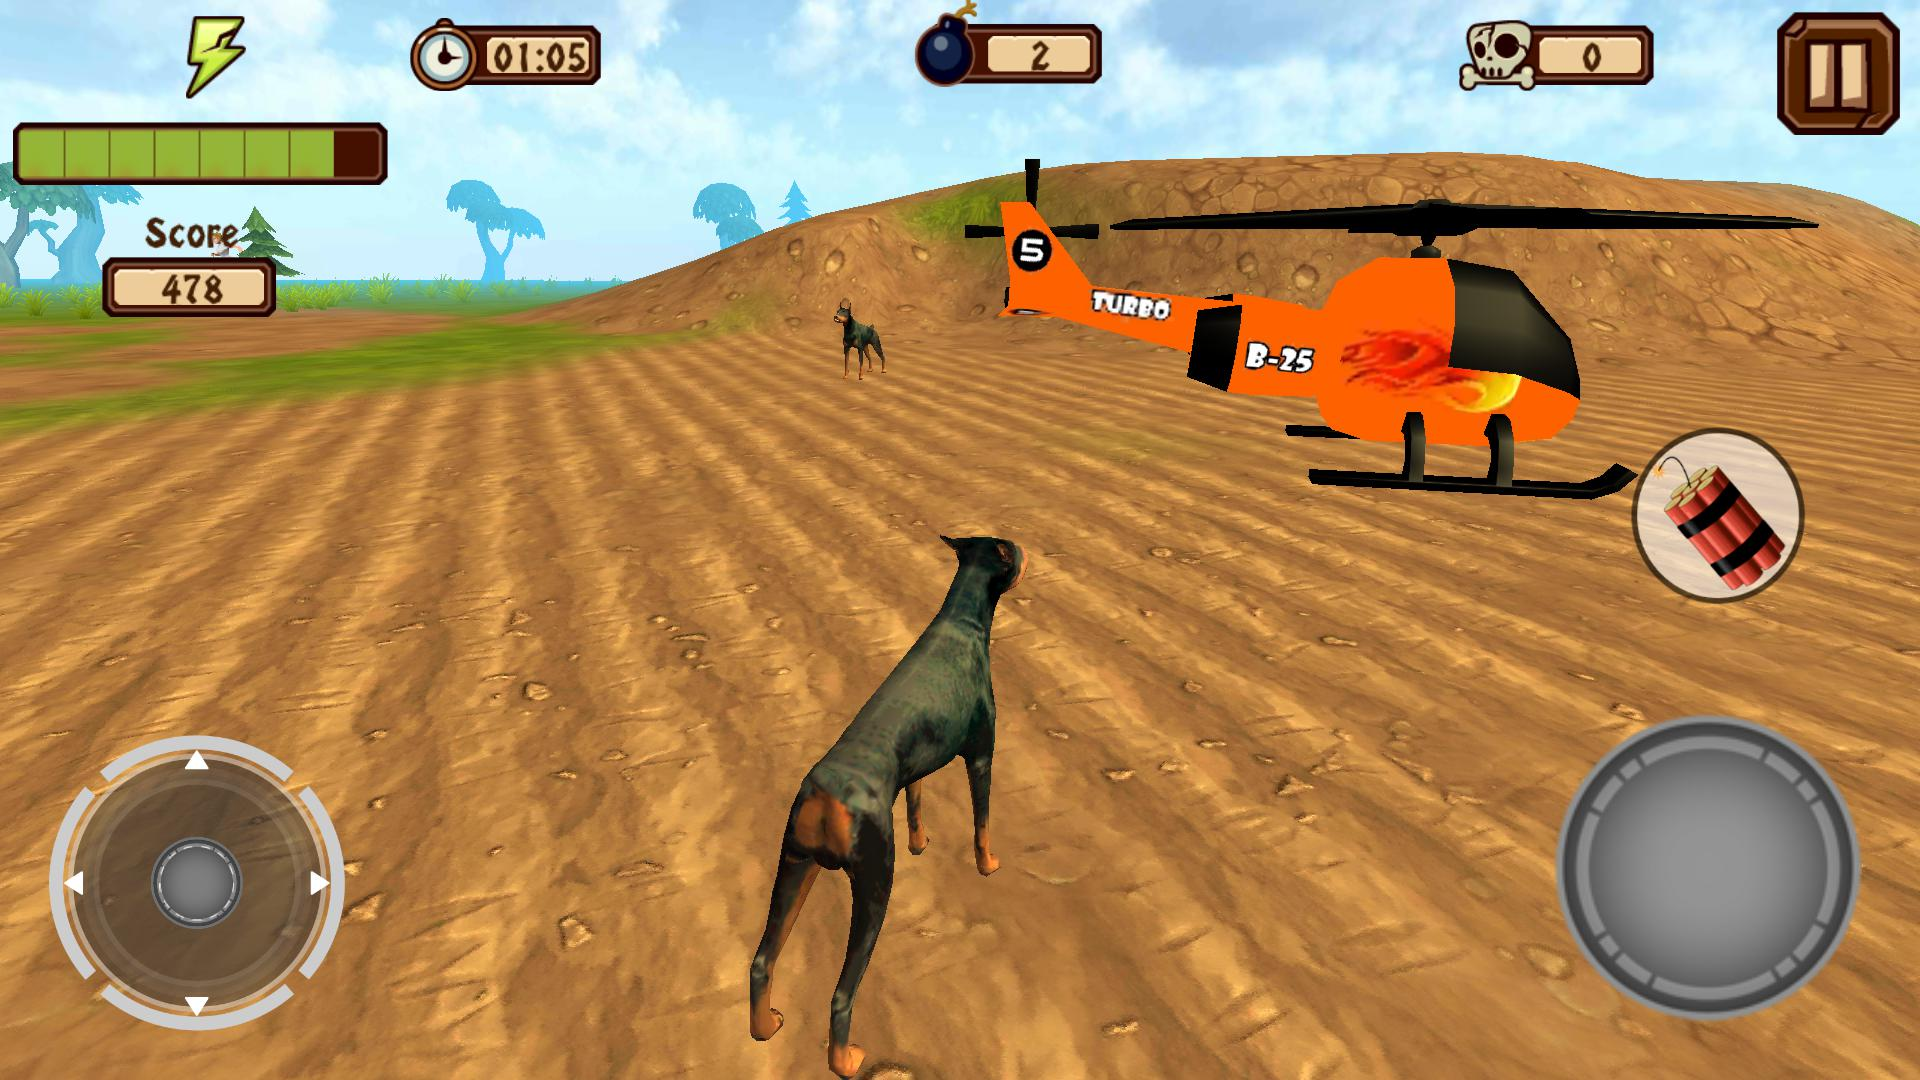 Doggy Dog Universe 游戏截图5